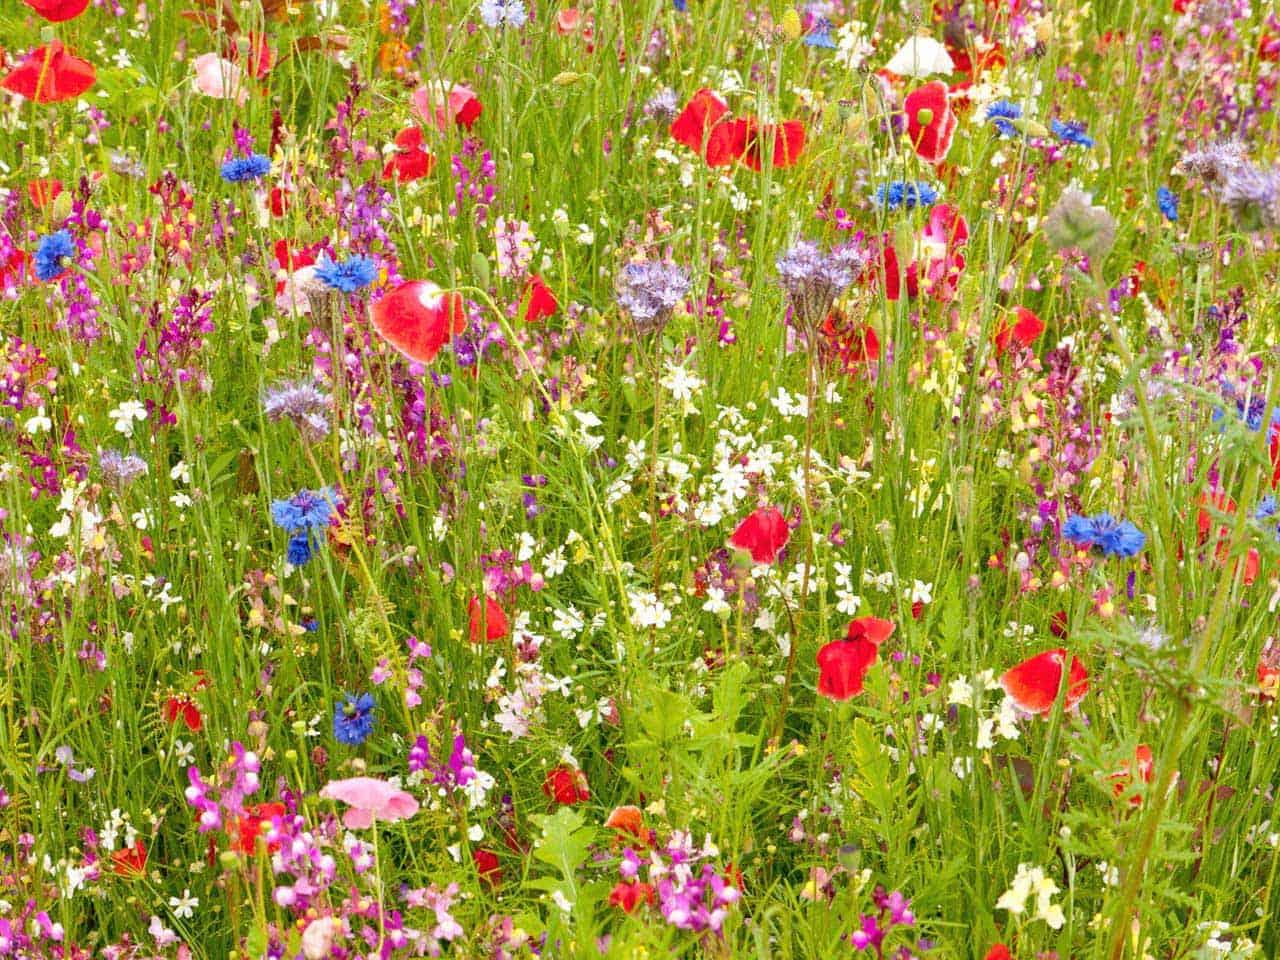 Wildflowers - Zulueta Corporación